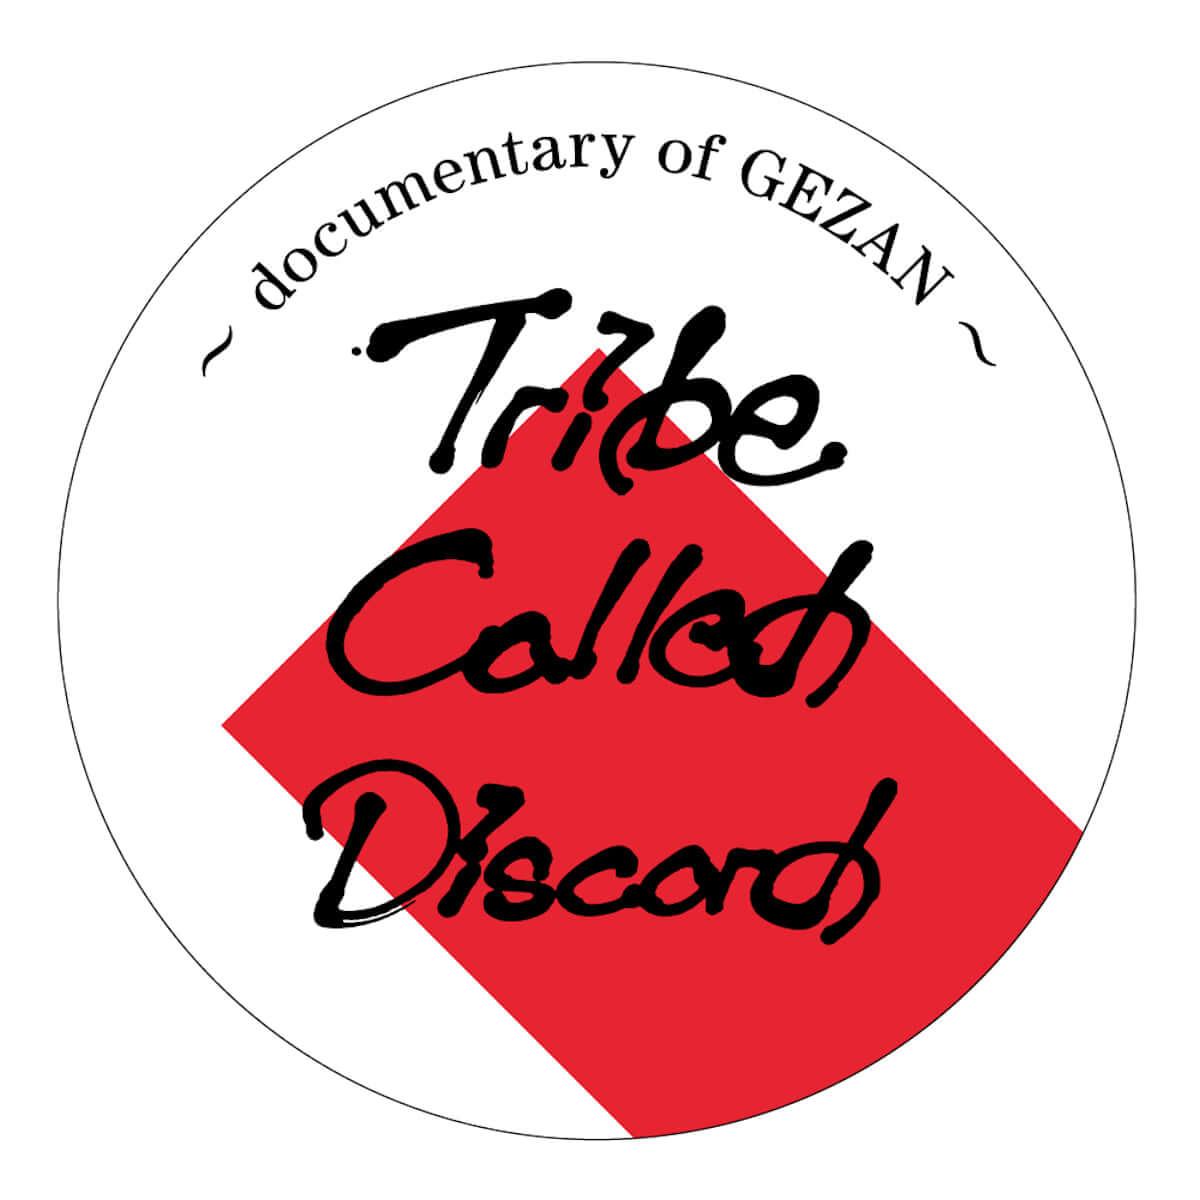 『Tribe Called Discord:Documentary of GEZAN』ライター磯部涼の映画評が公開 film190423_gezan_2-1200x1200